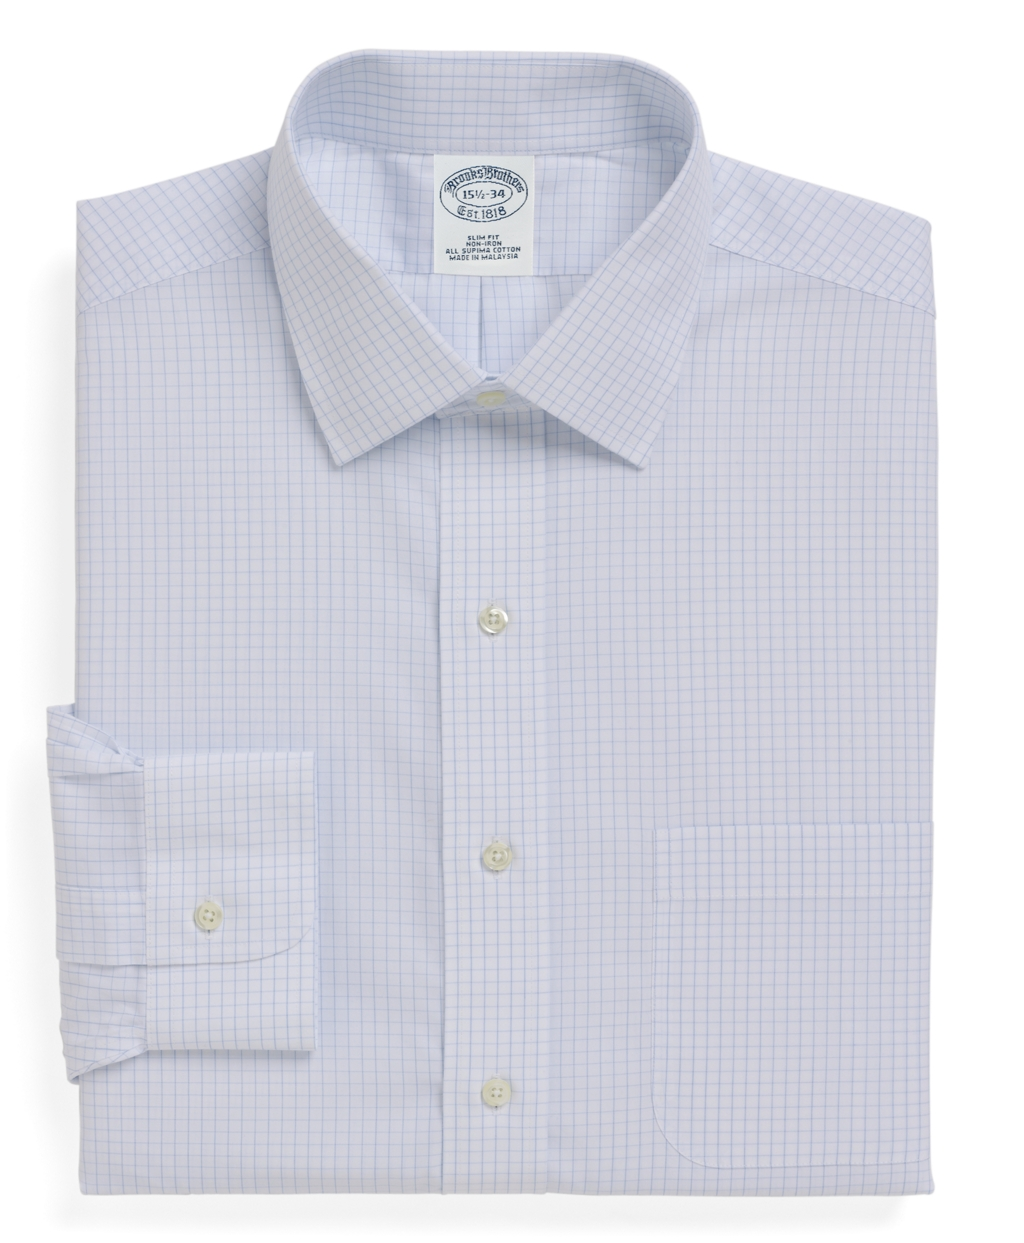 Brooks brothers non iron regent fit medium check dress for Brooks brothers non iron shirts review